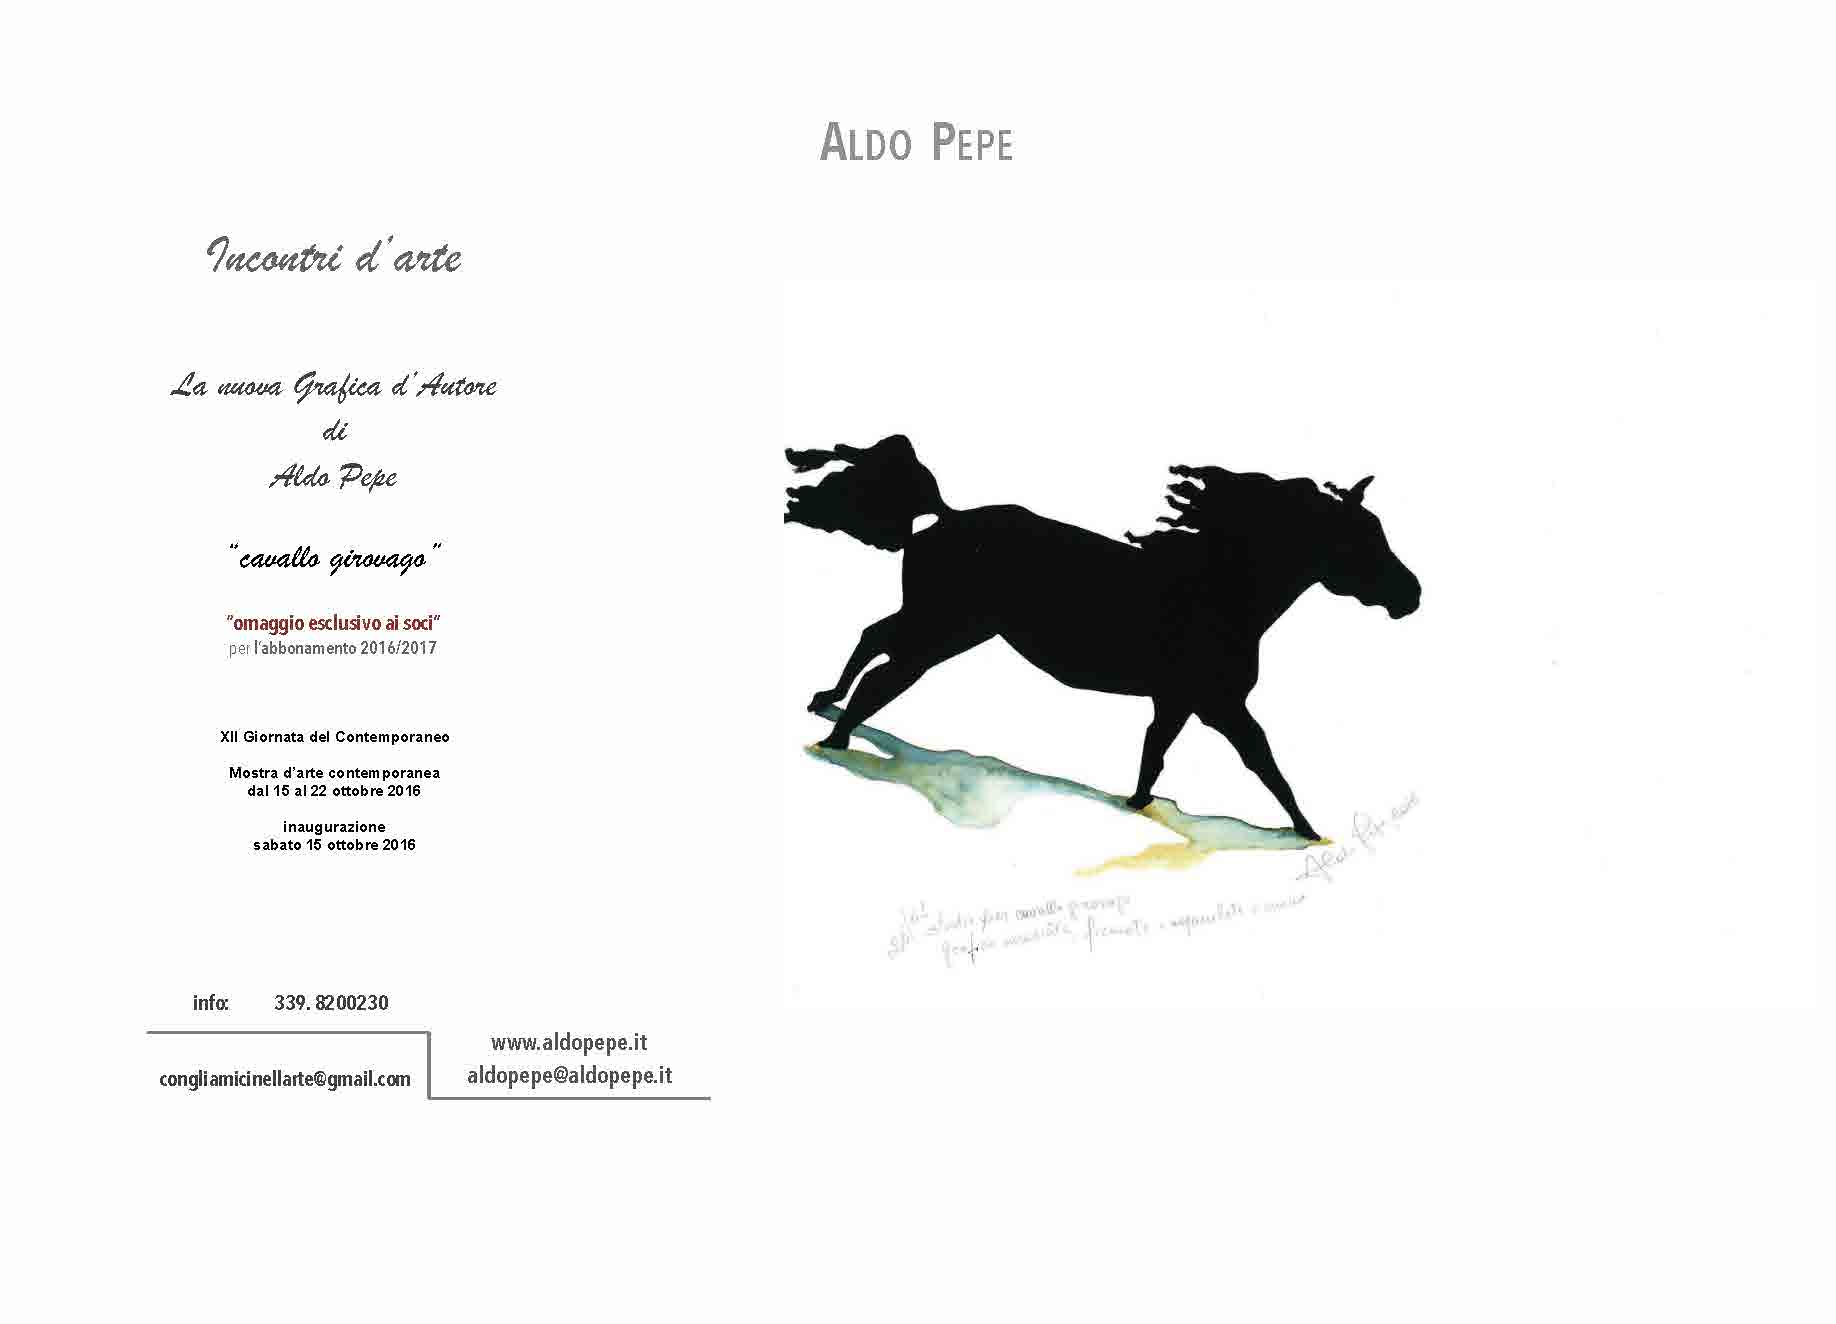 aldo-pepe-cavallo-girovago